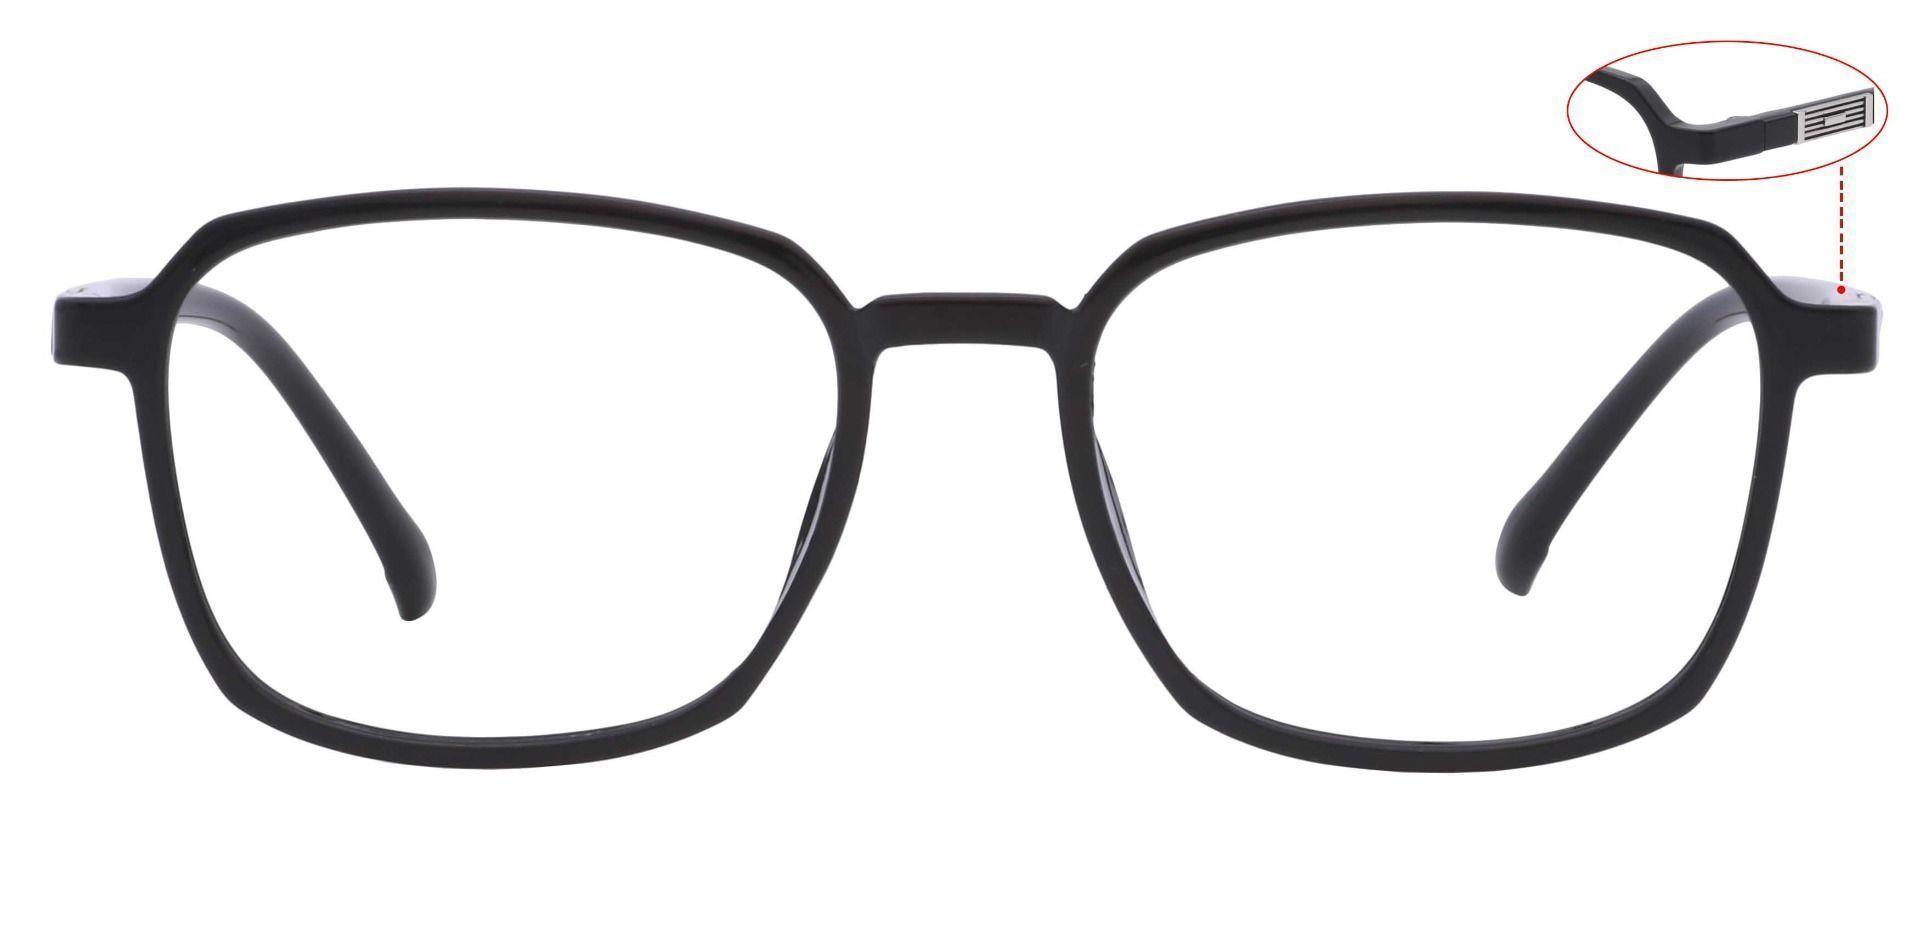 Stella Square Eyeglasses Frame - Black